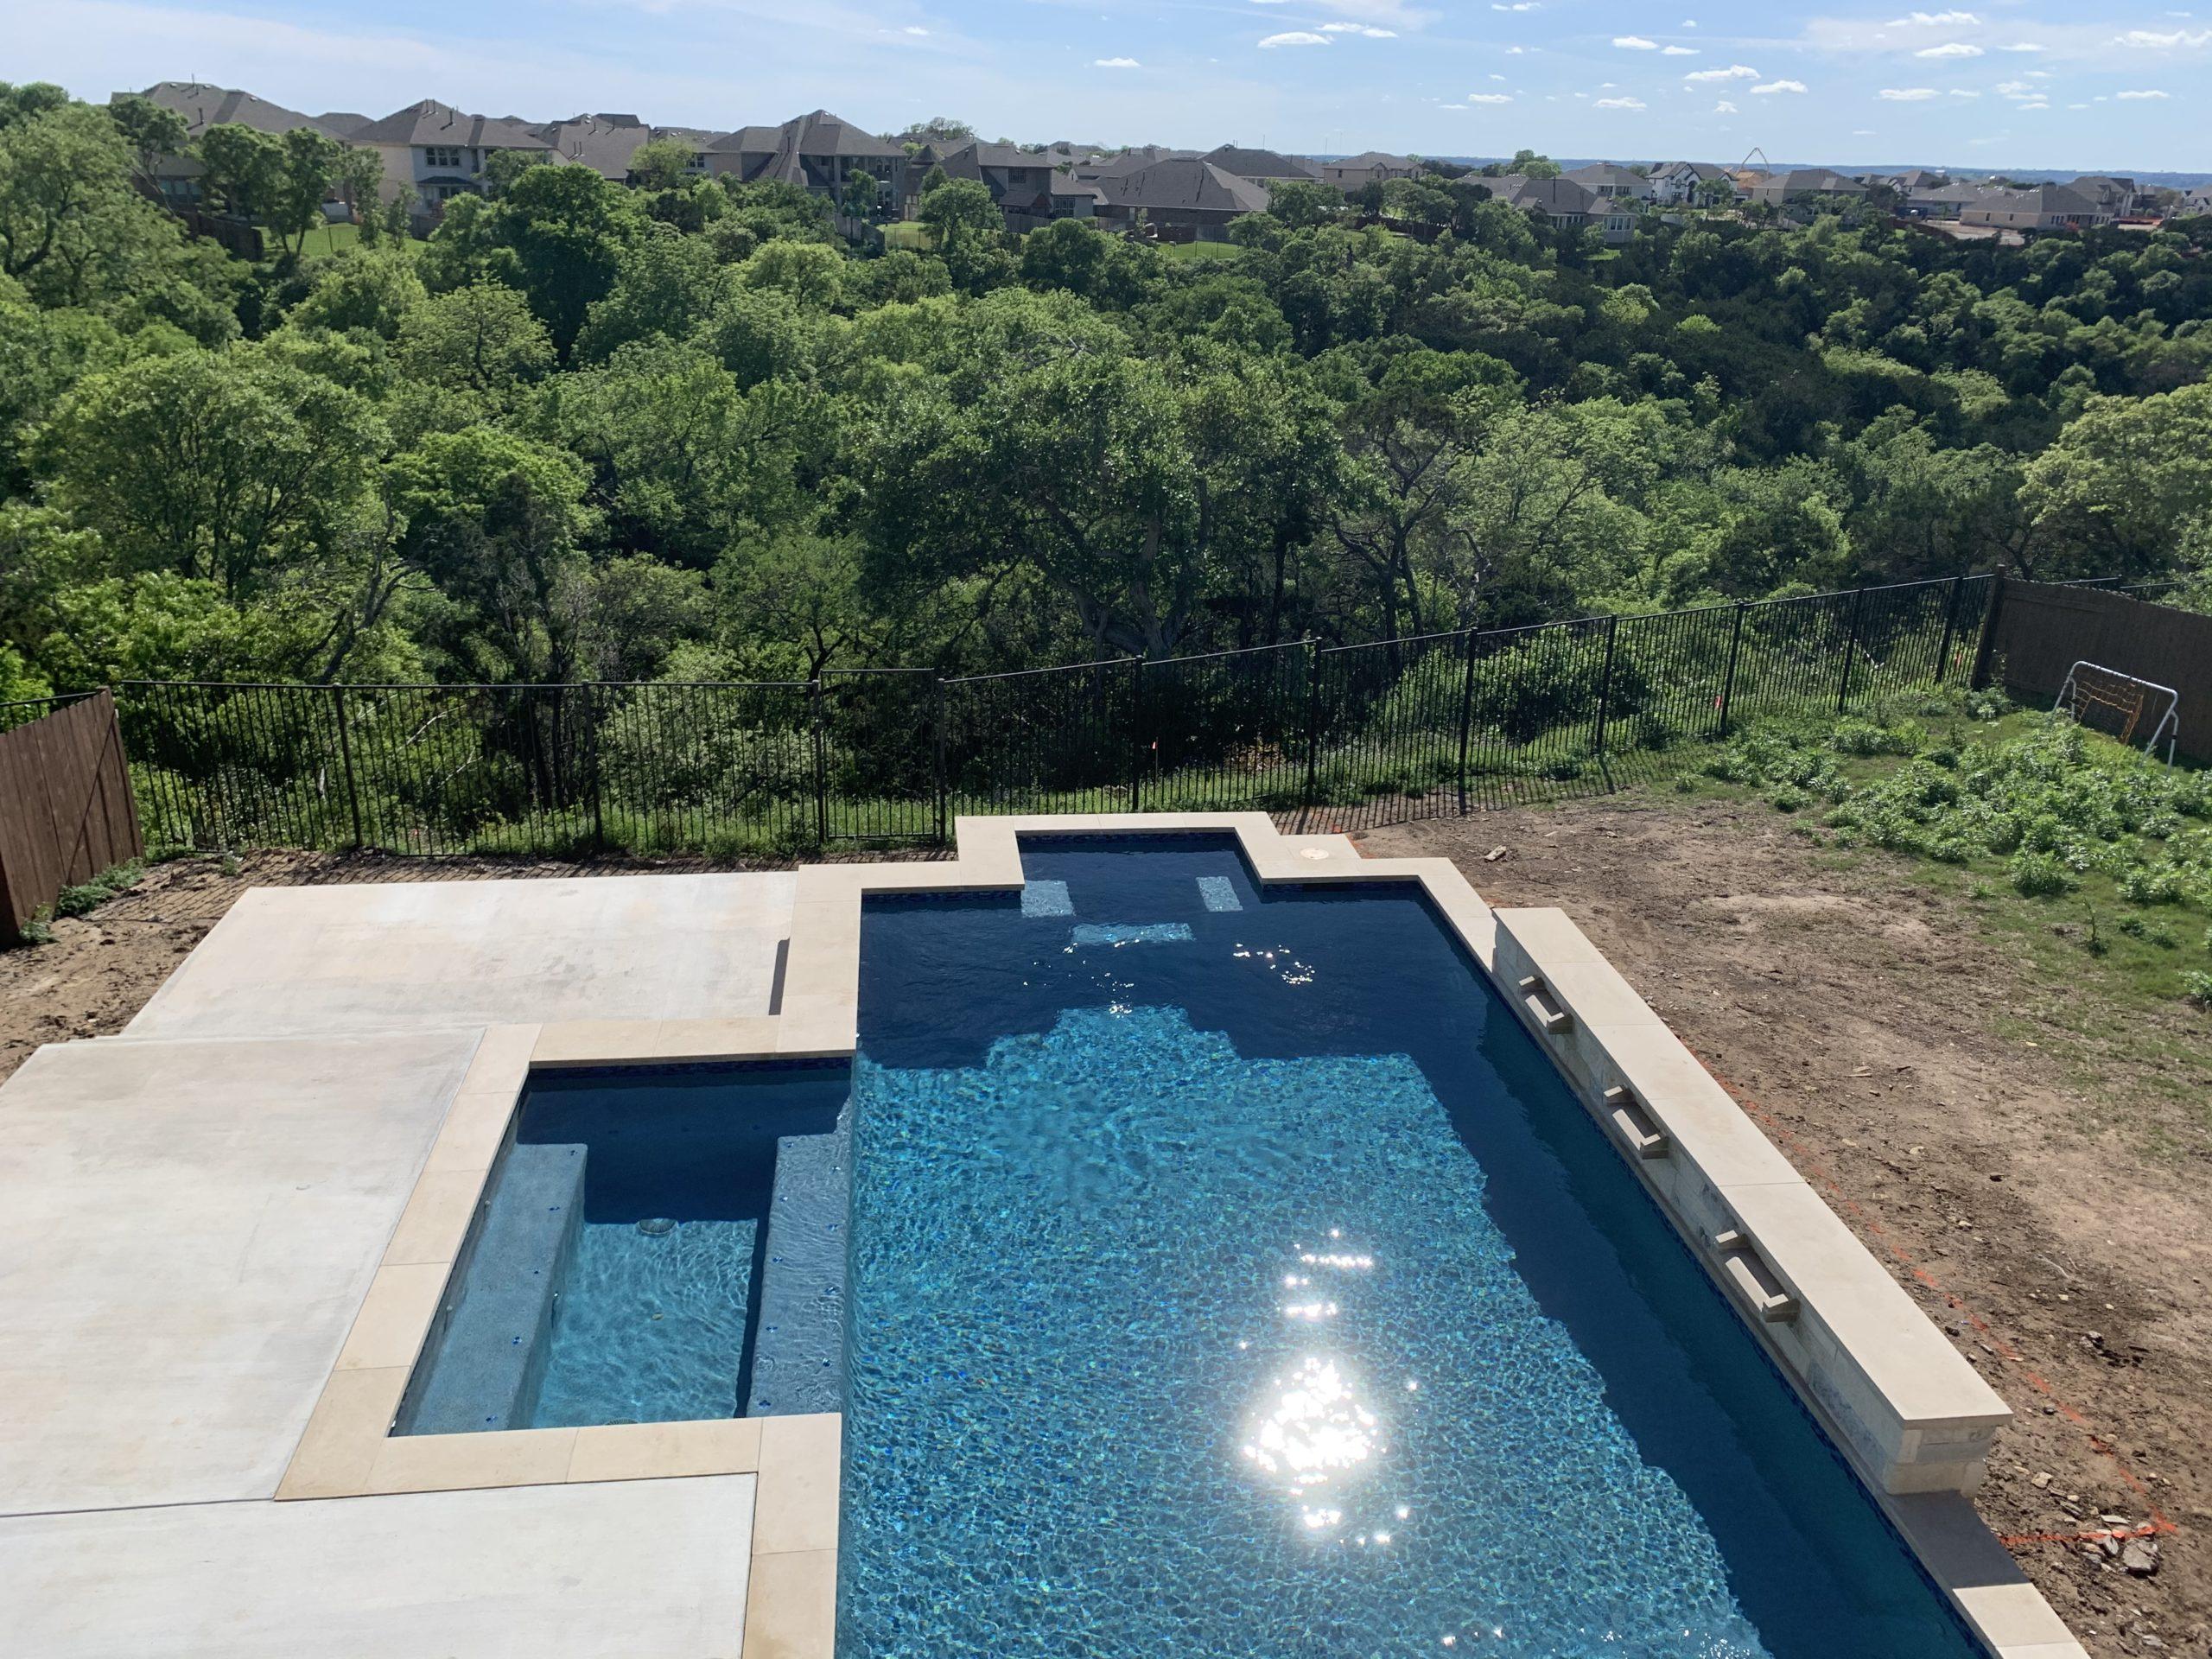 S pool